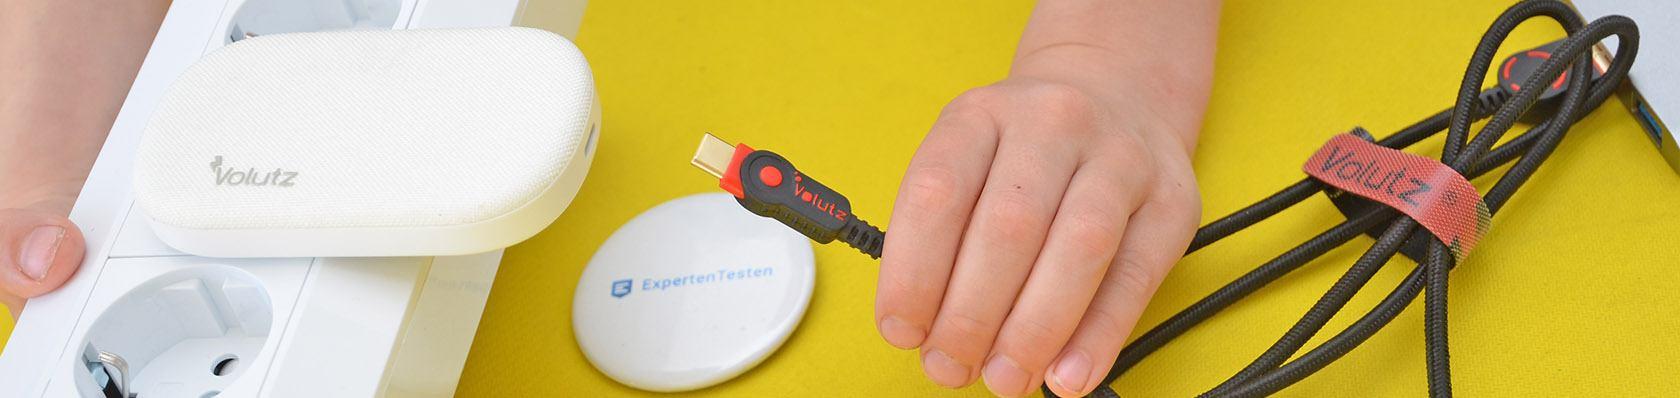 USB-C Ladegeräte im Test auf ExpertenTesten.de